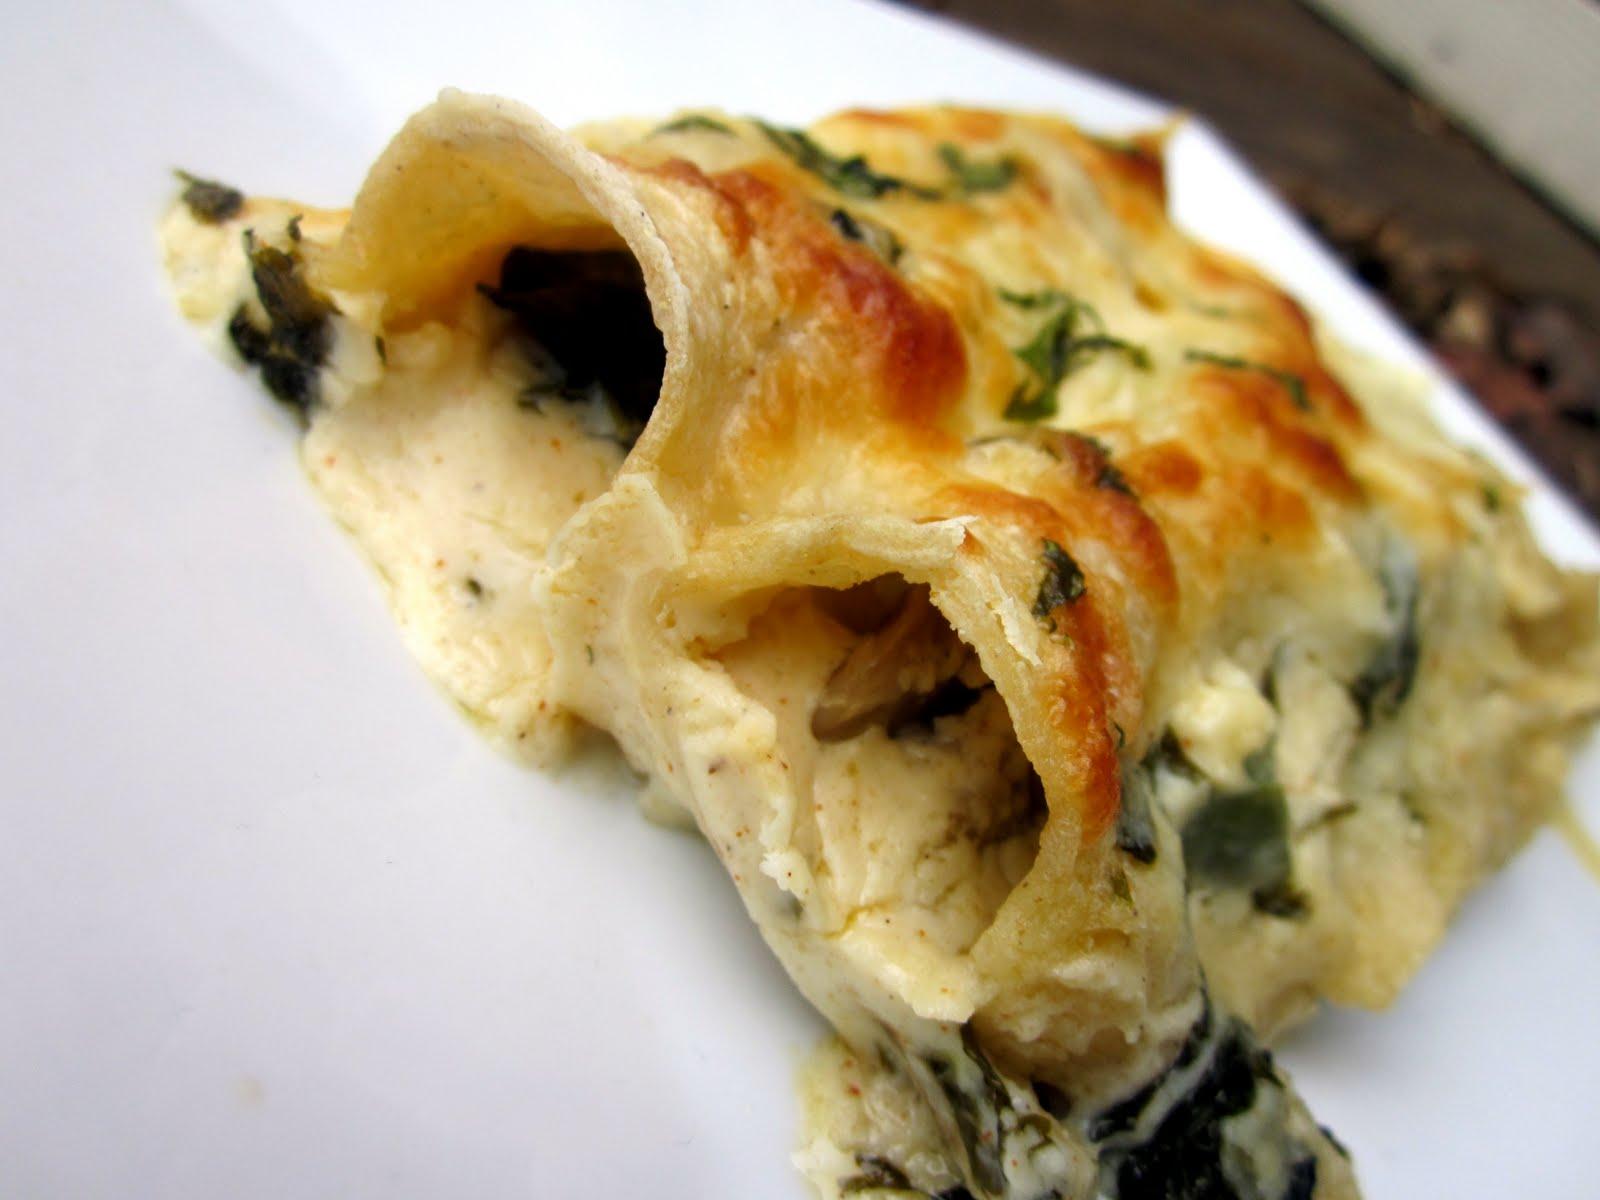 delightful country cookin': spinach mushroom enchiladas